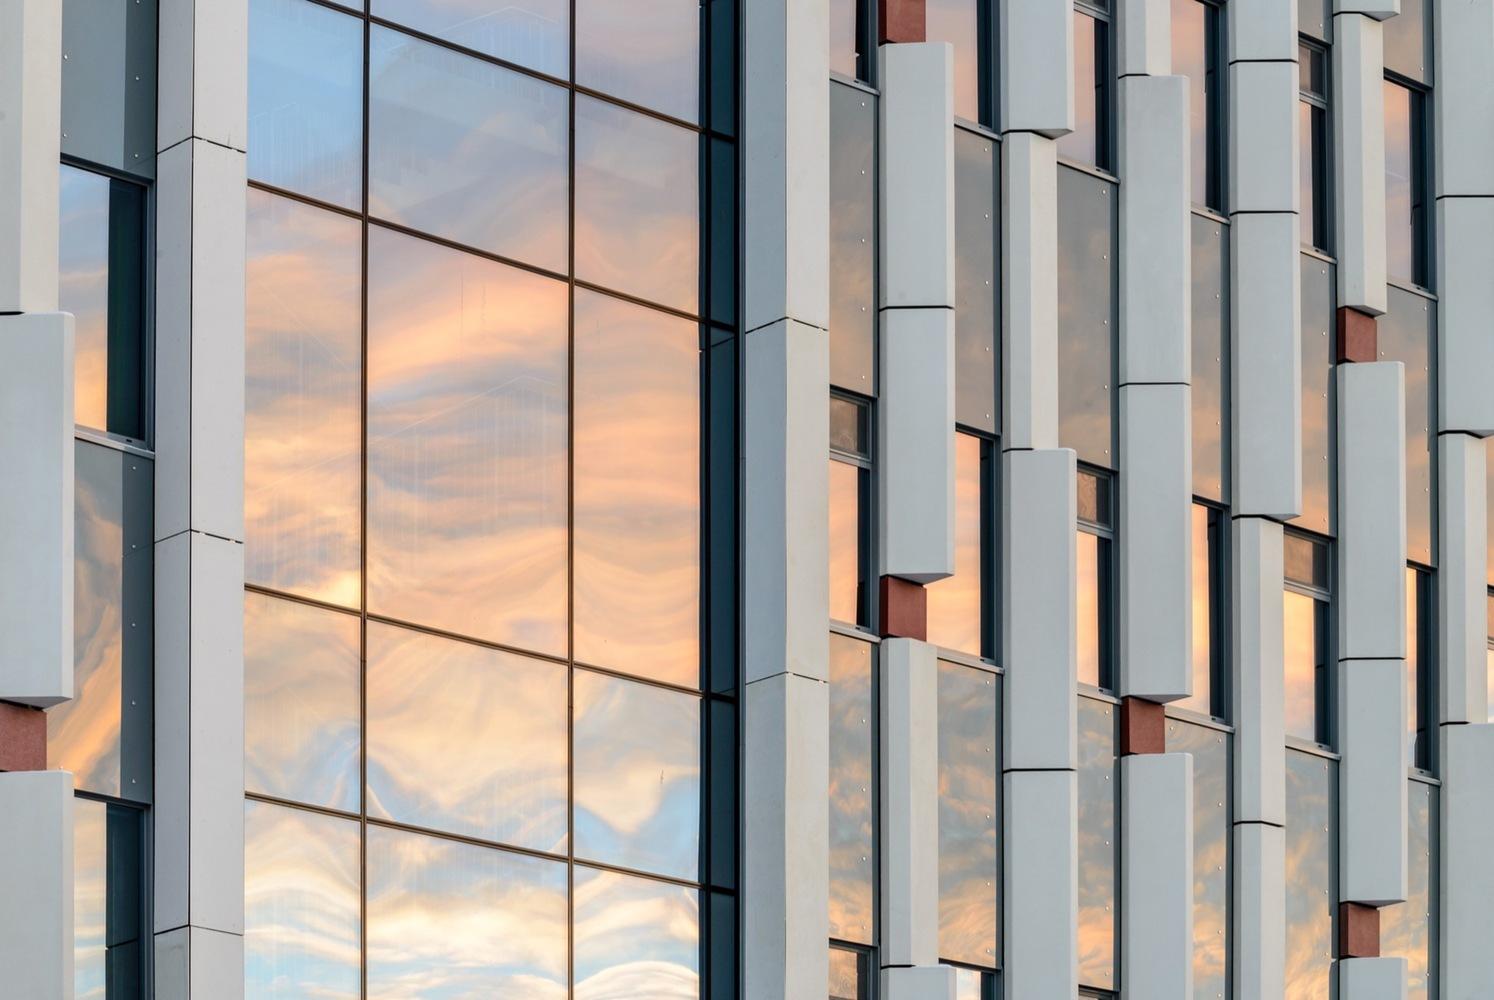 Pivoting, Sliding, Accordion and Curtain Wall: Different Types Of Windows In 11 Buildings,Life Science Centre of Vilnius University / Architektūros linija. Image © Martynas Slapšy